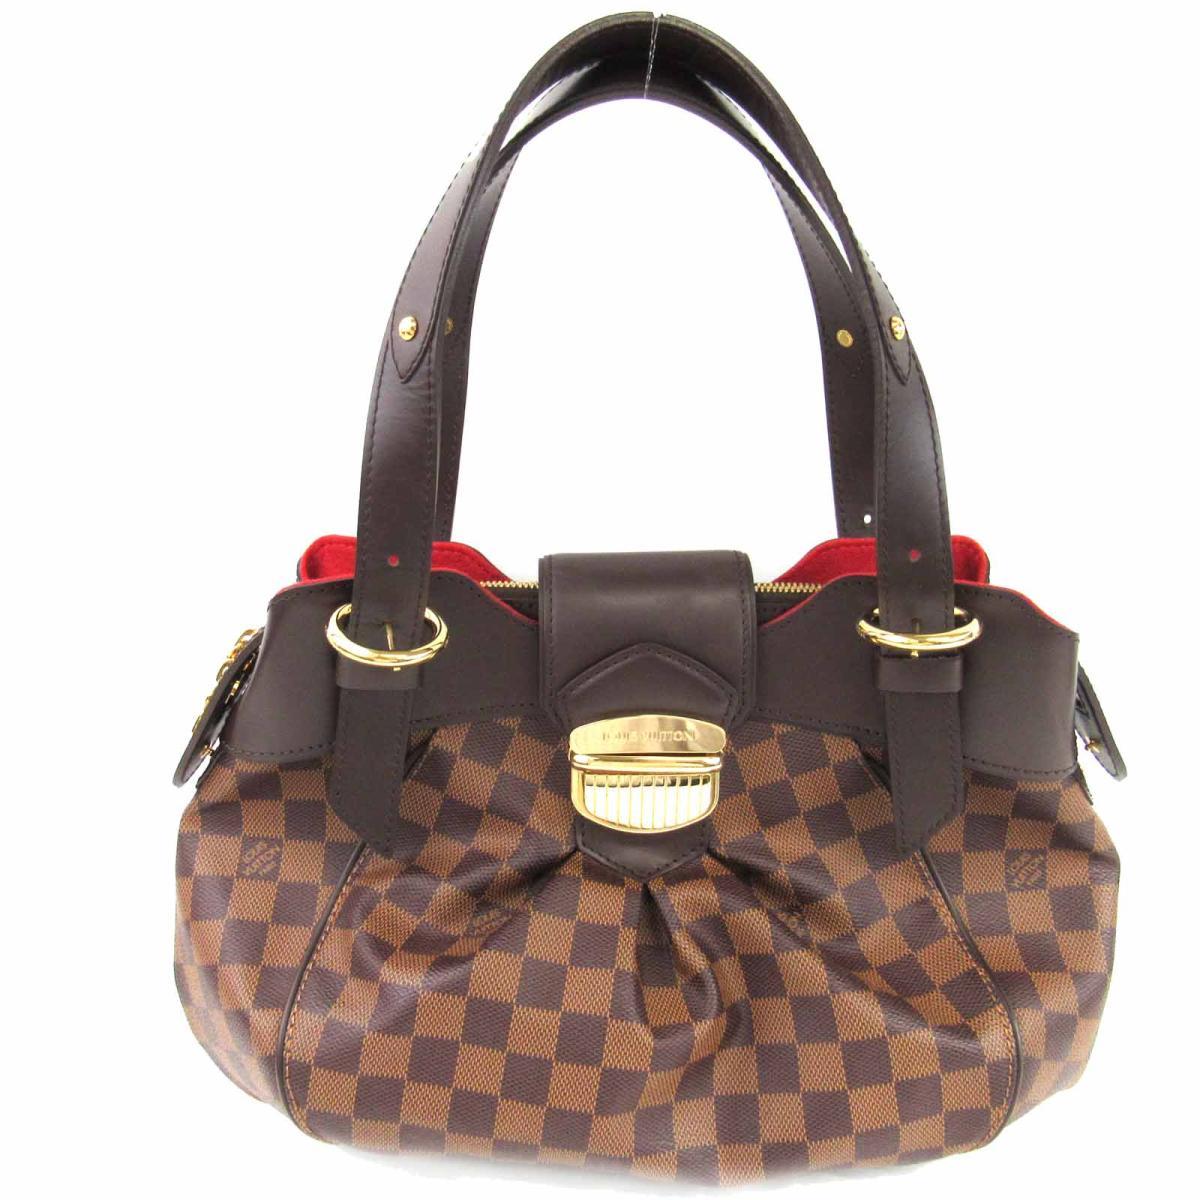 97cd04ada01f ... LOUIS VUITTON ヴィトン ビトン ルイ·ヴィトン ハンドバッグ バッグ バック 鞄 カバン BAG ブランドバッグ ブランドバック  美品 ブランドオフ BRANDOFF